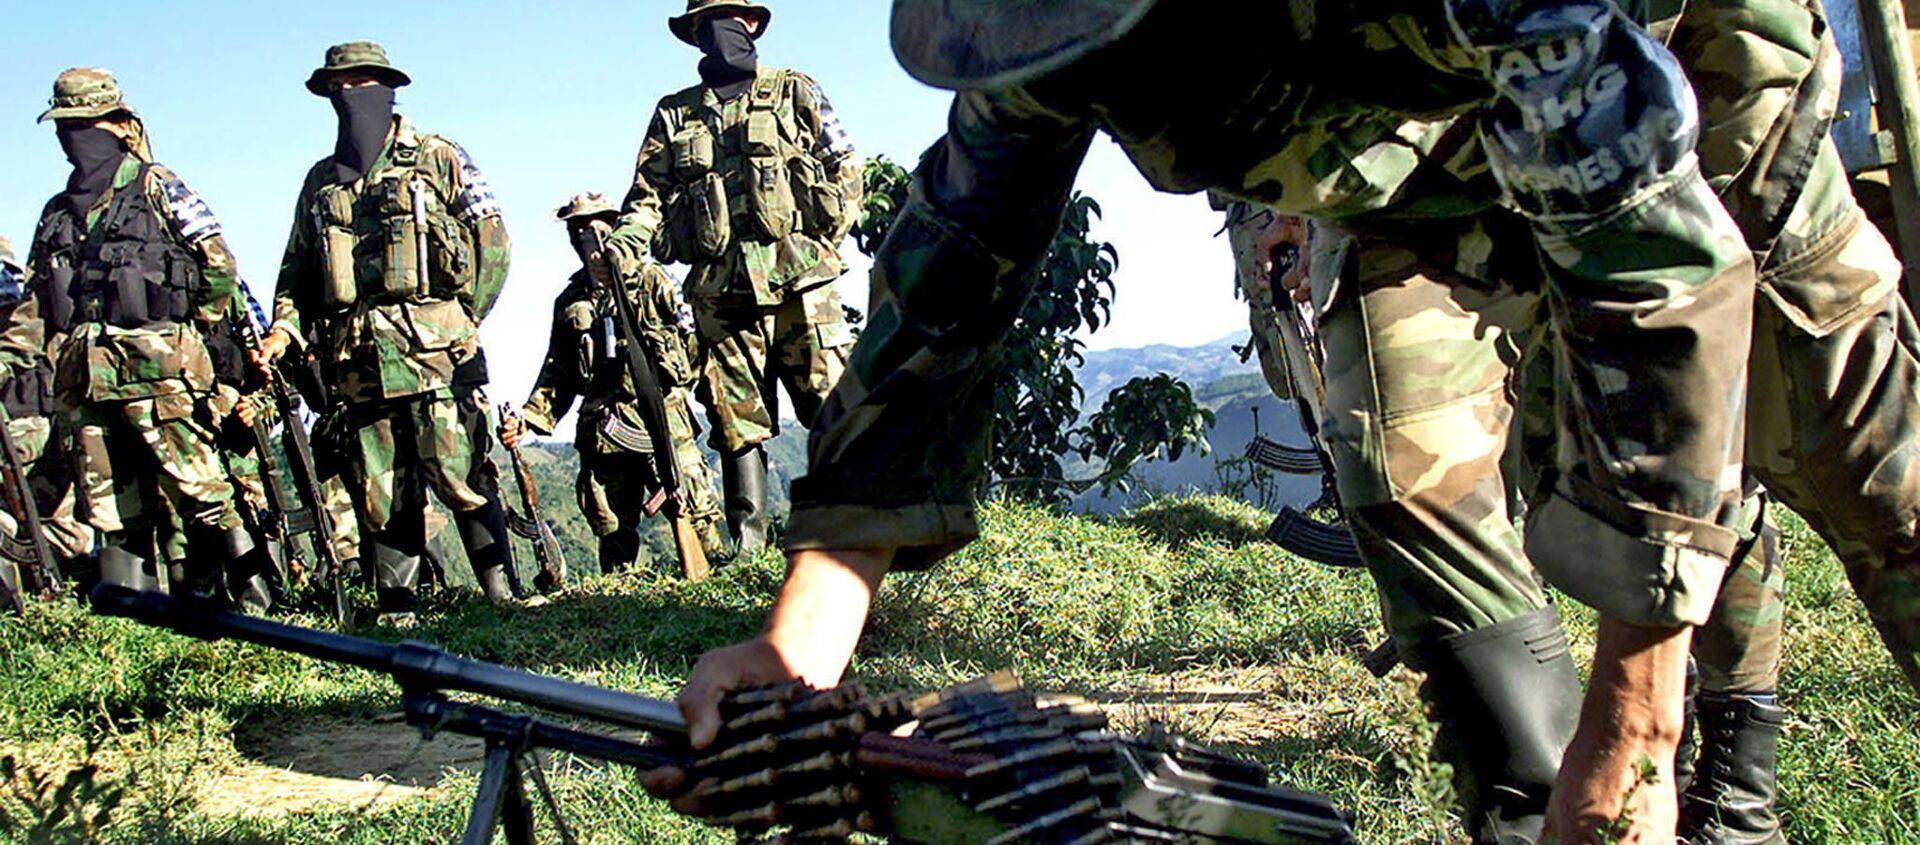 Paramilitares de las Autodefensas Unidas de Colombia  - Sputnik Mundo, 1920, 01.09.2020